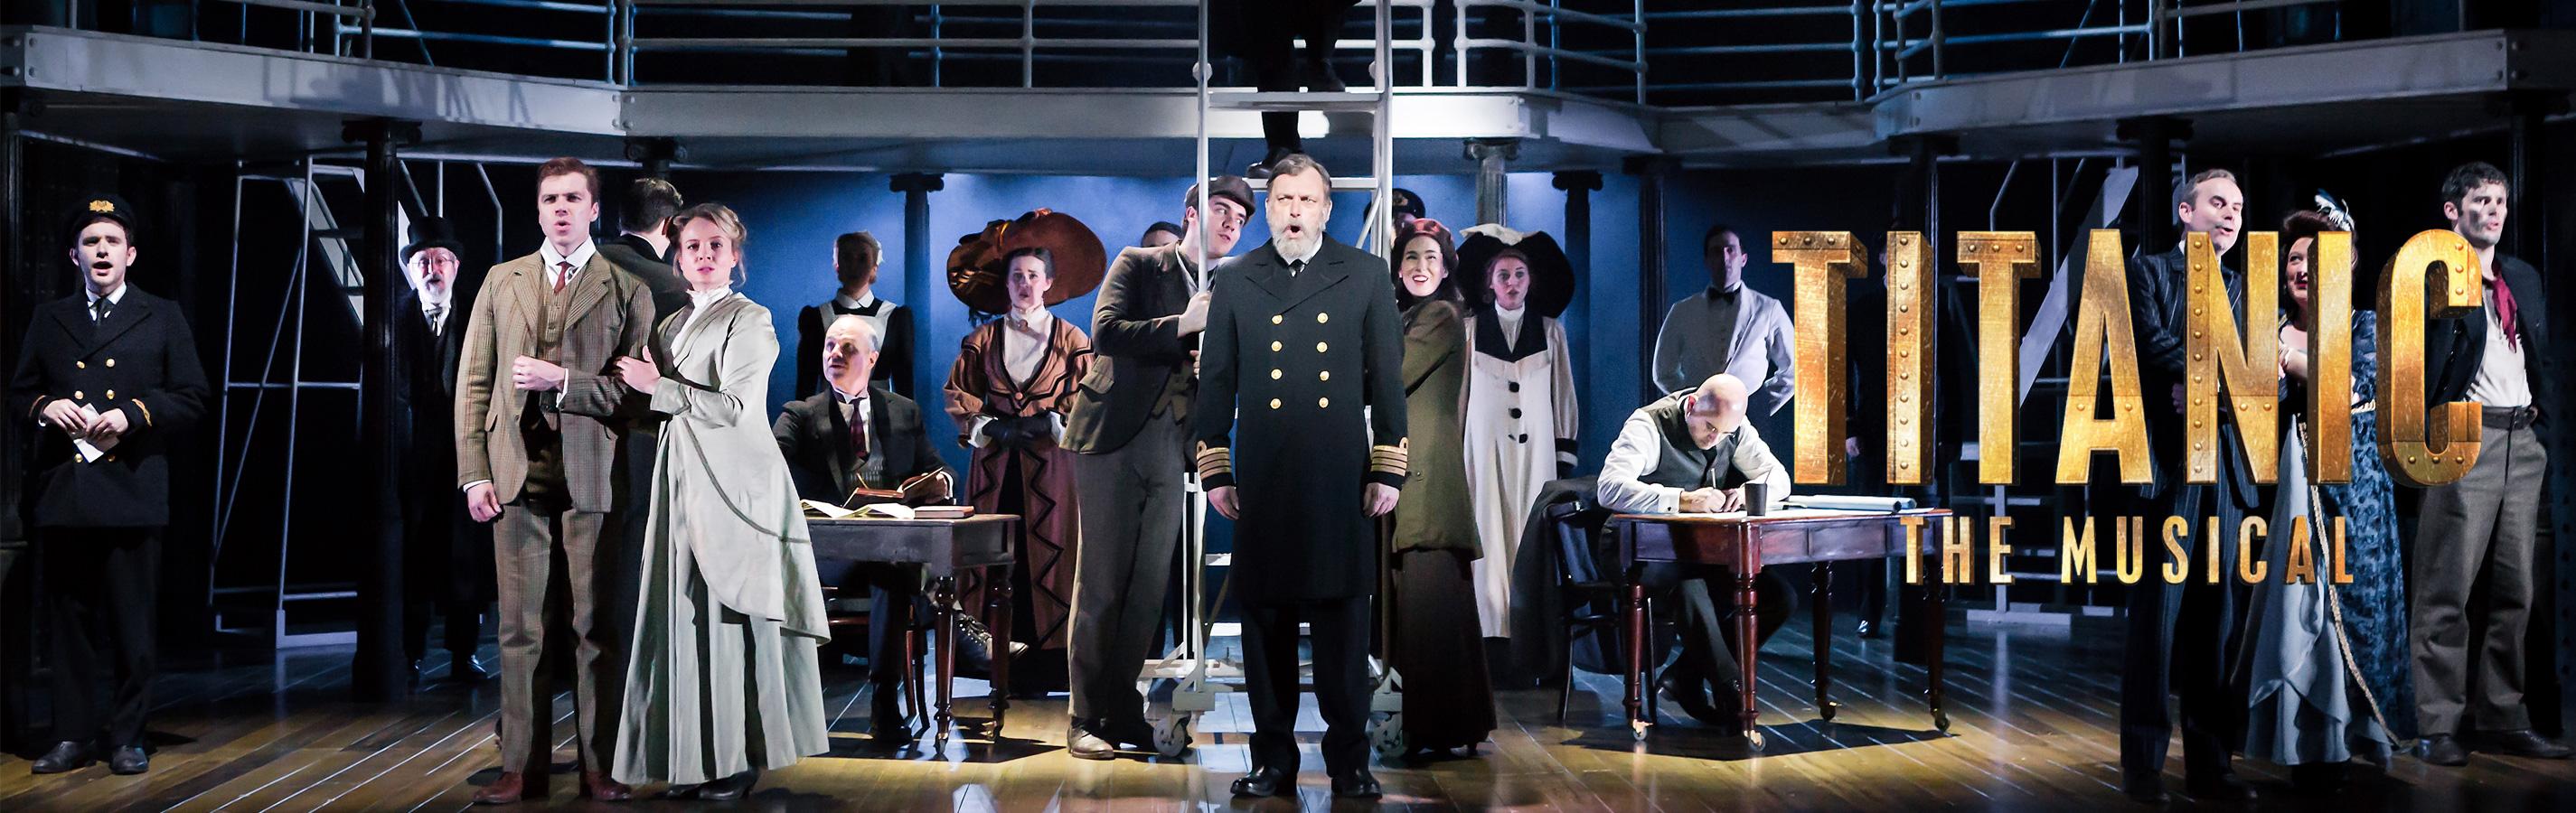 Titanic The Musical Header